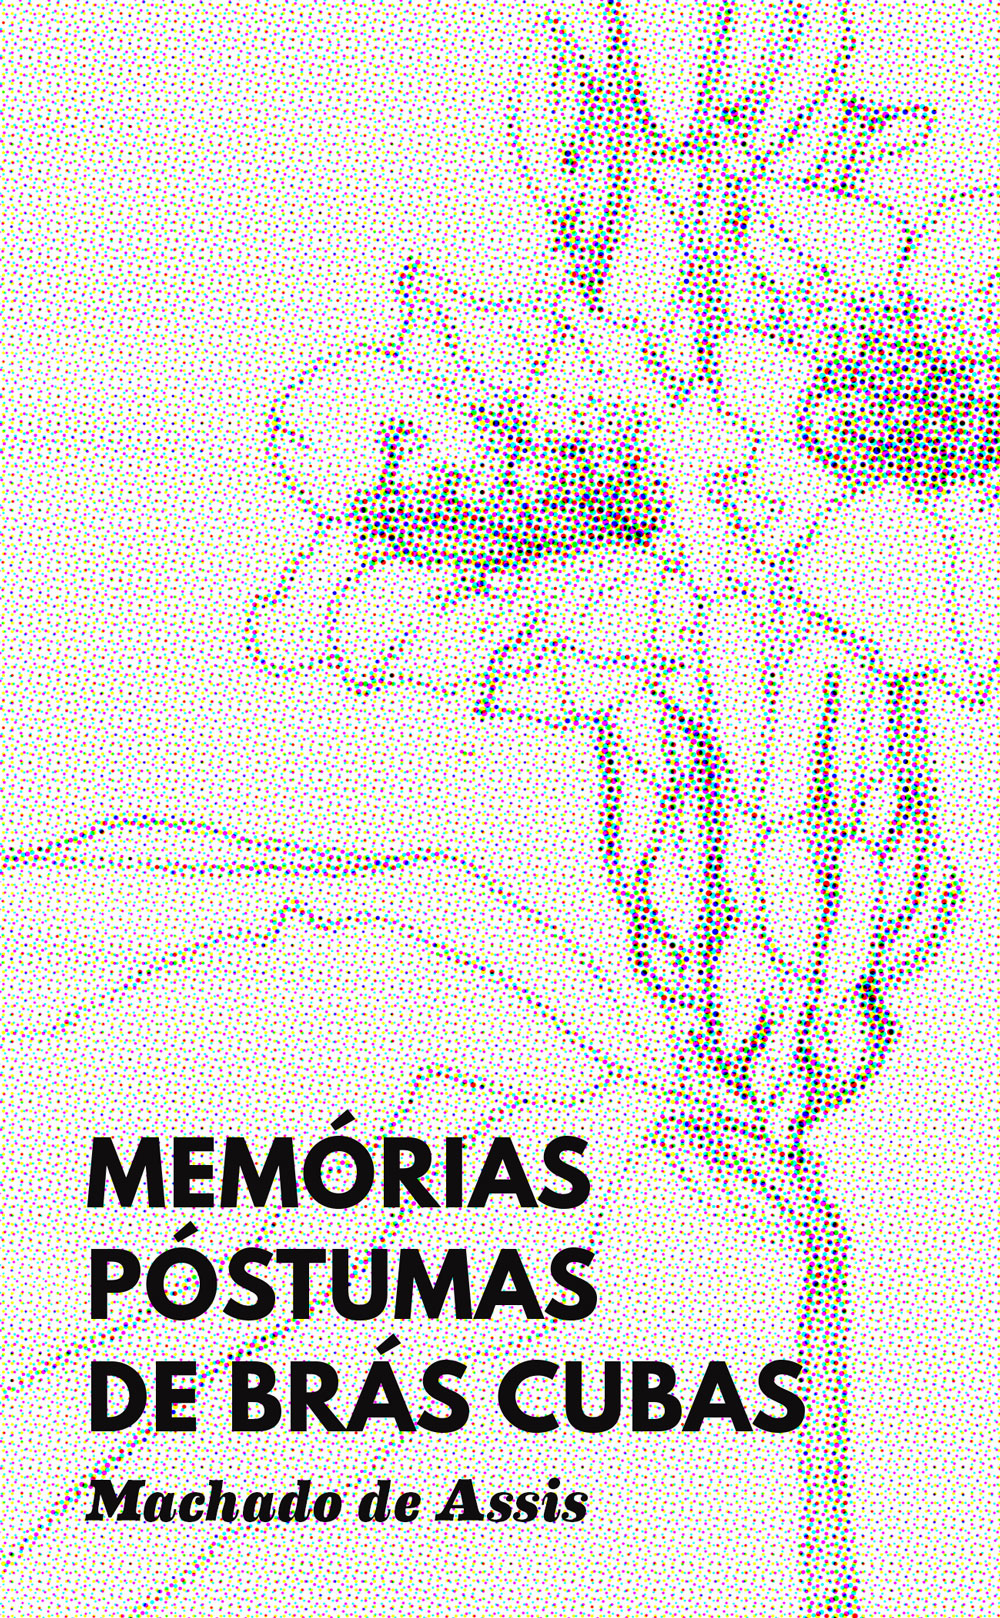 bras-cubas_-cover_01.jpg